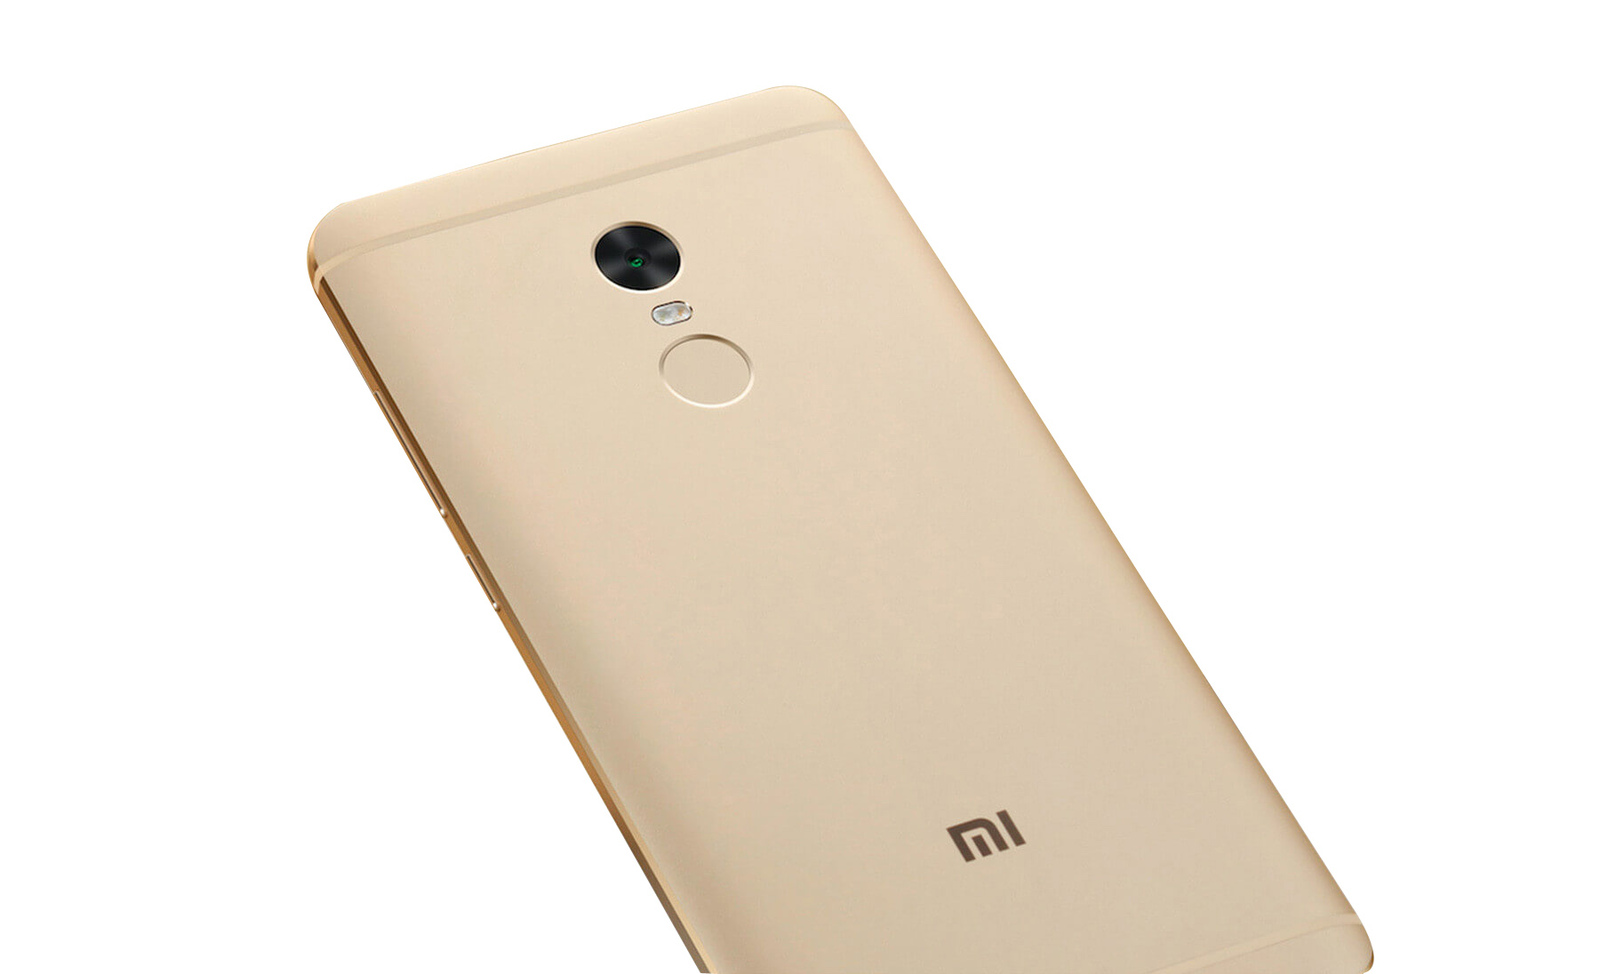 xiaomi redmi note 4 gold 3gb 64gb 5 5 fhd screen android